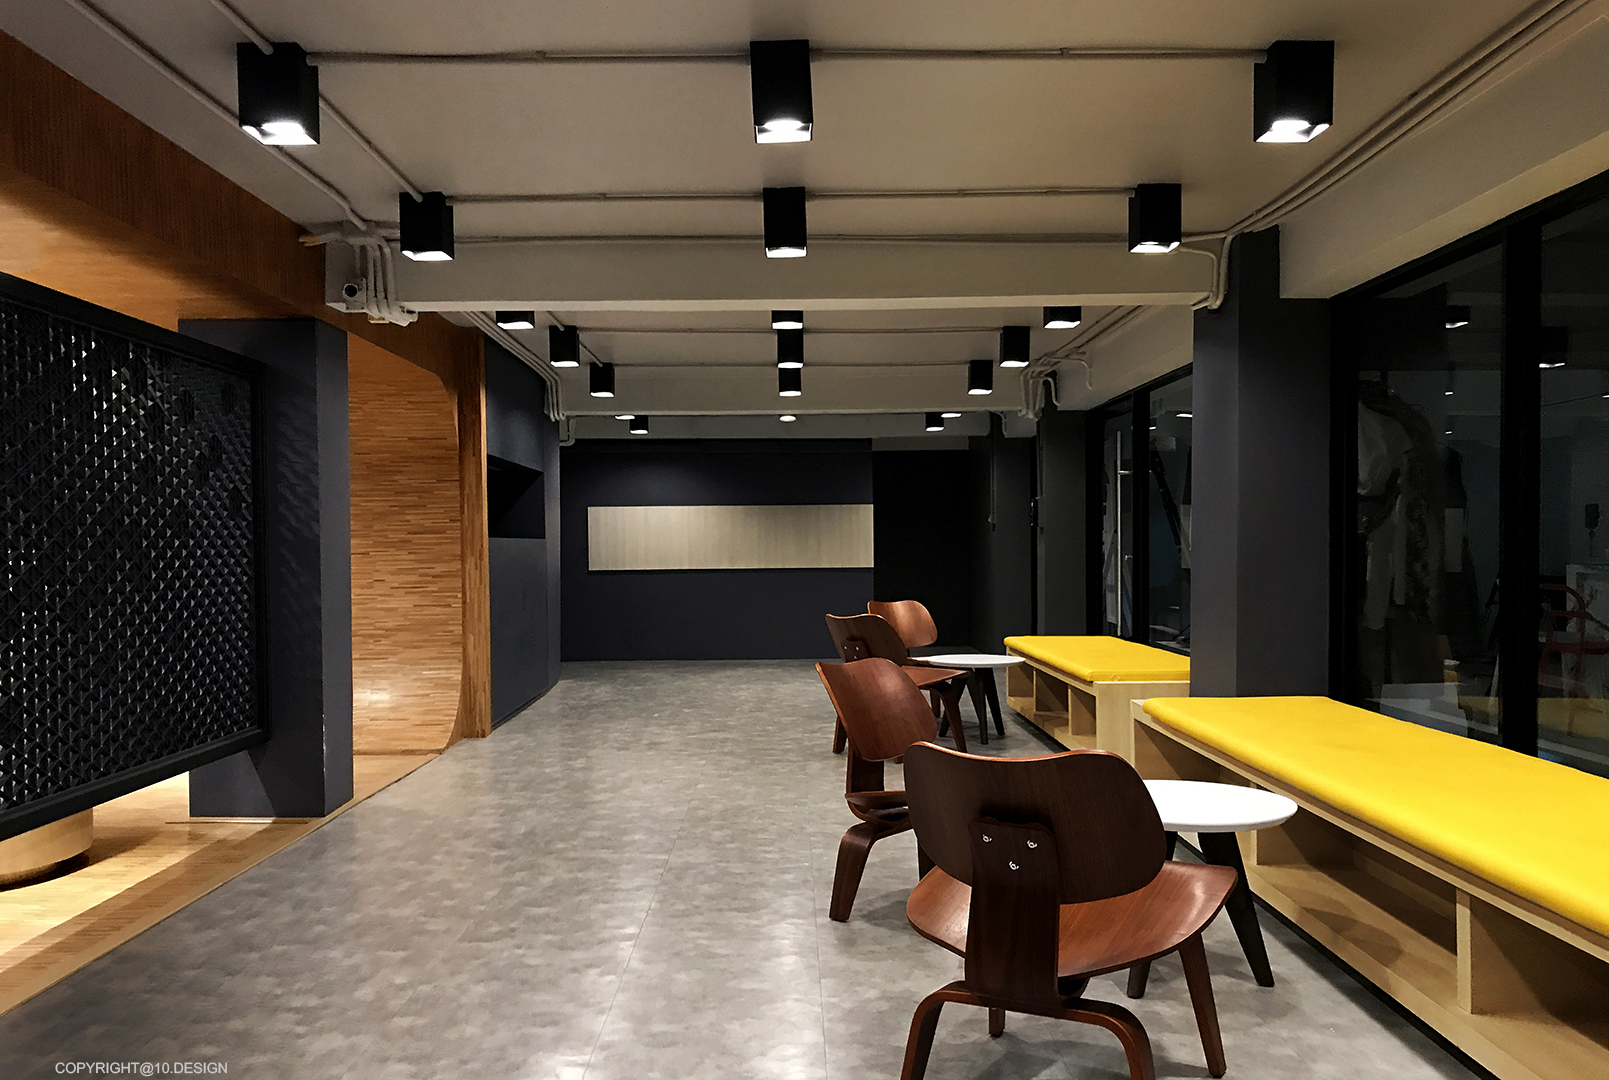 10DESIGN ookbee head office interior design start up 11